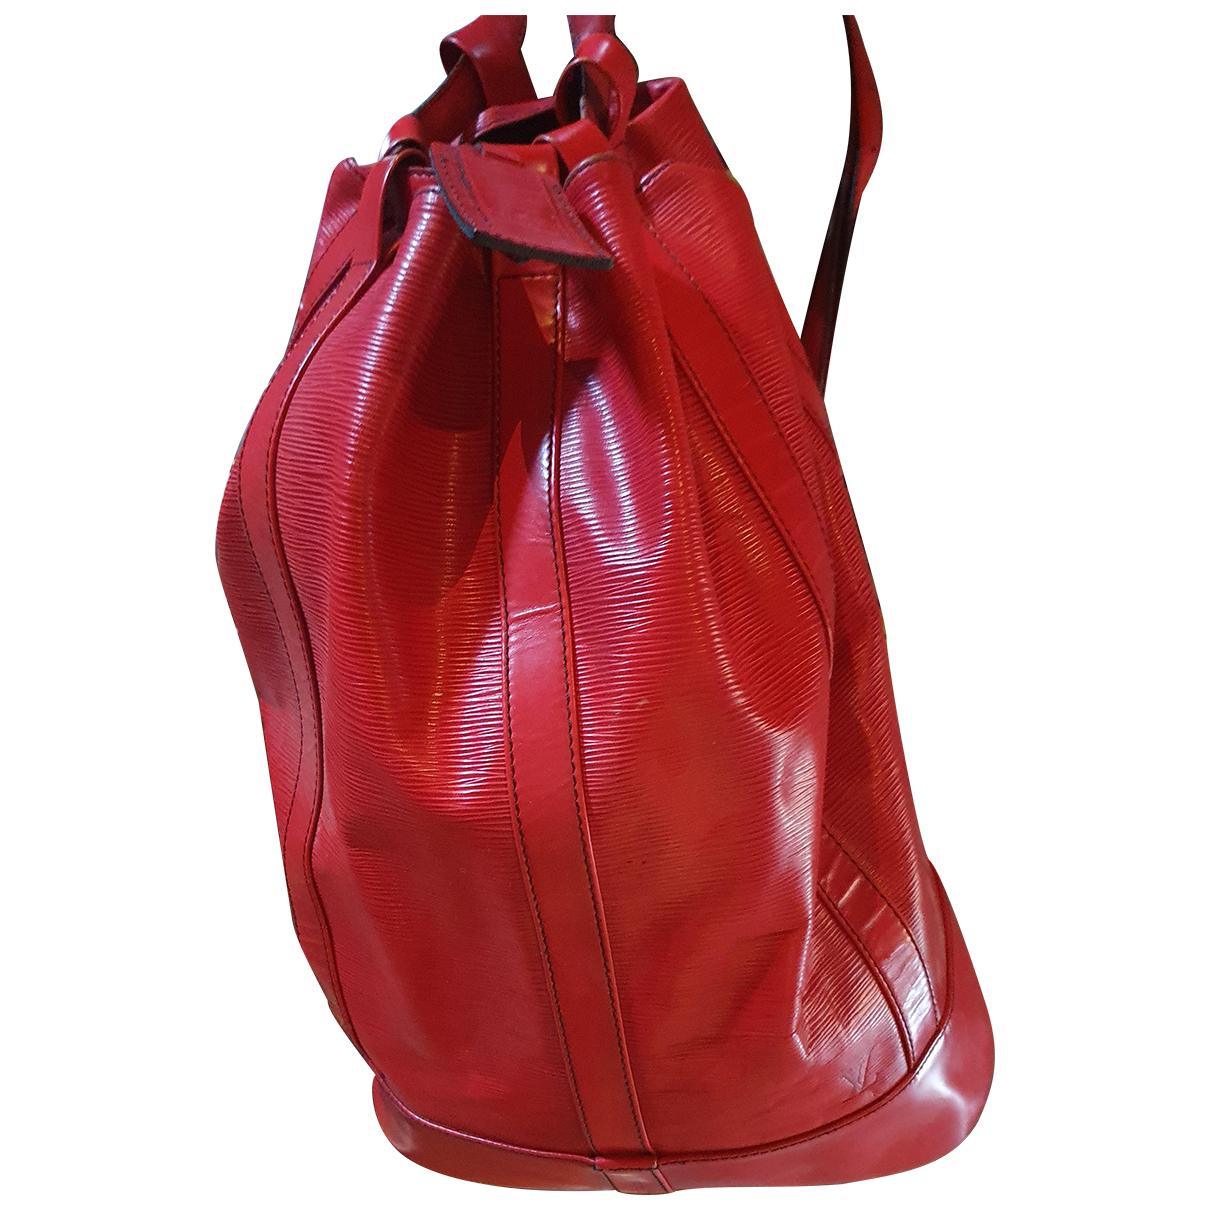 Louis Vuitton Randonnee Rucksaecke in  Rot Leder